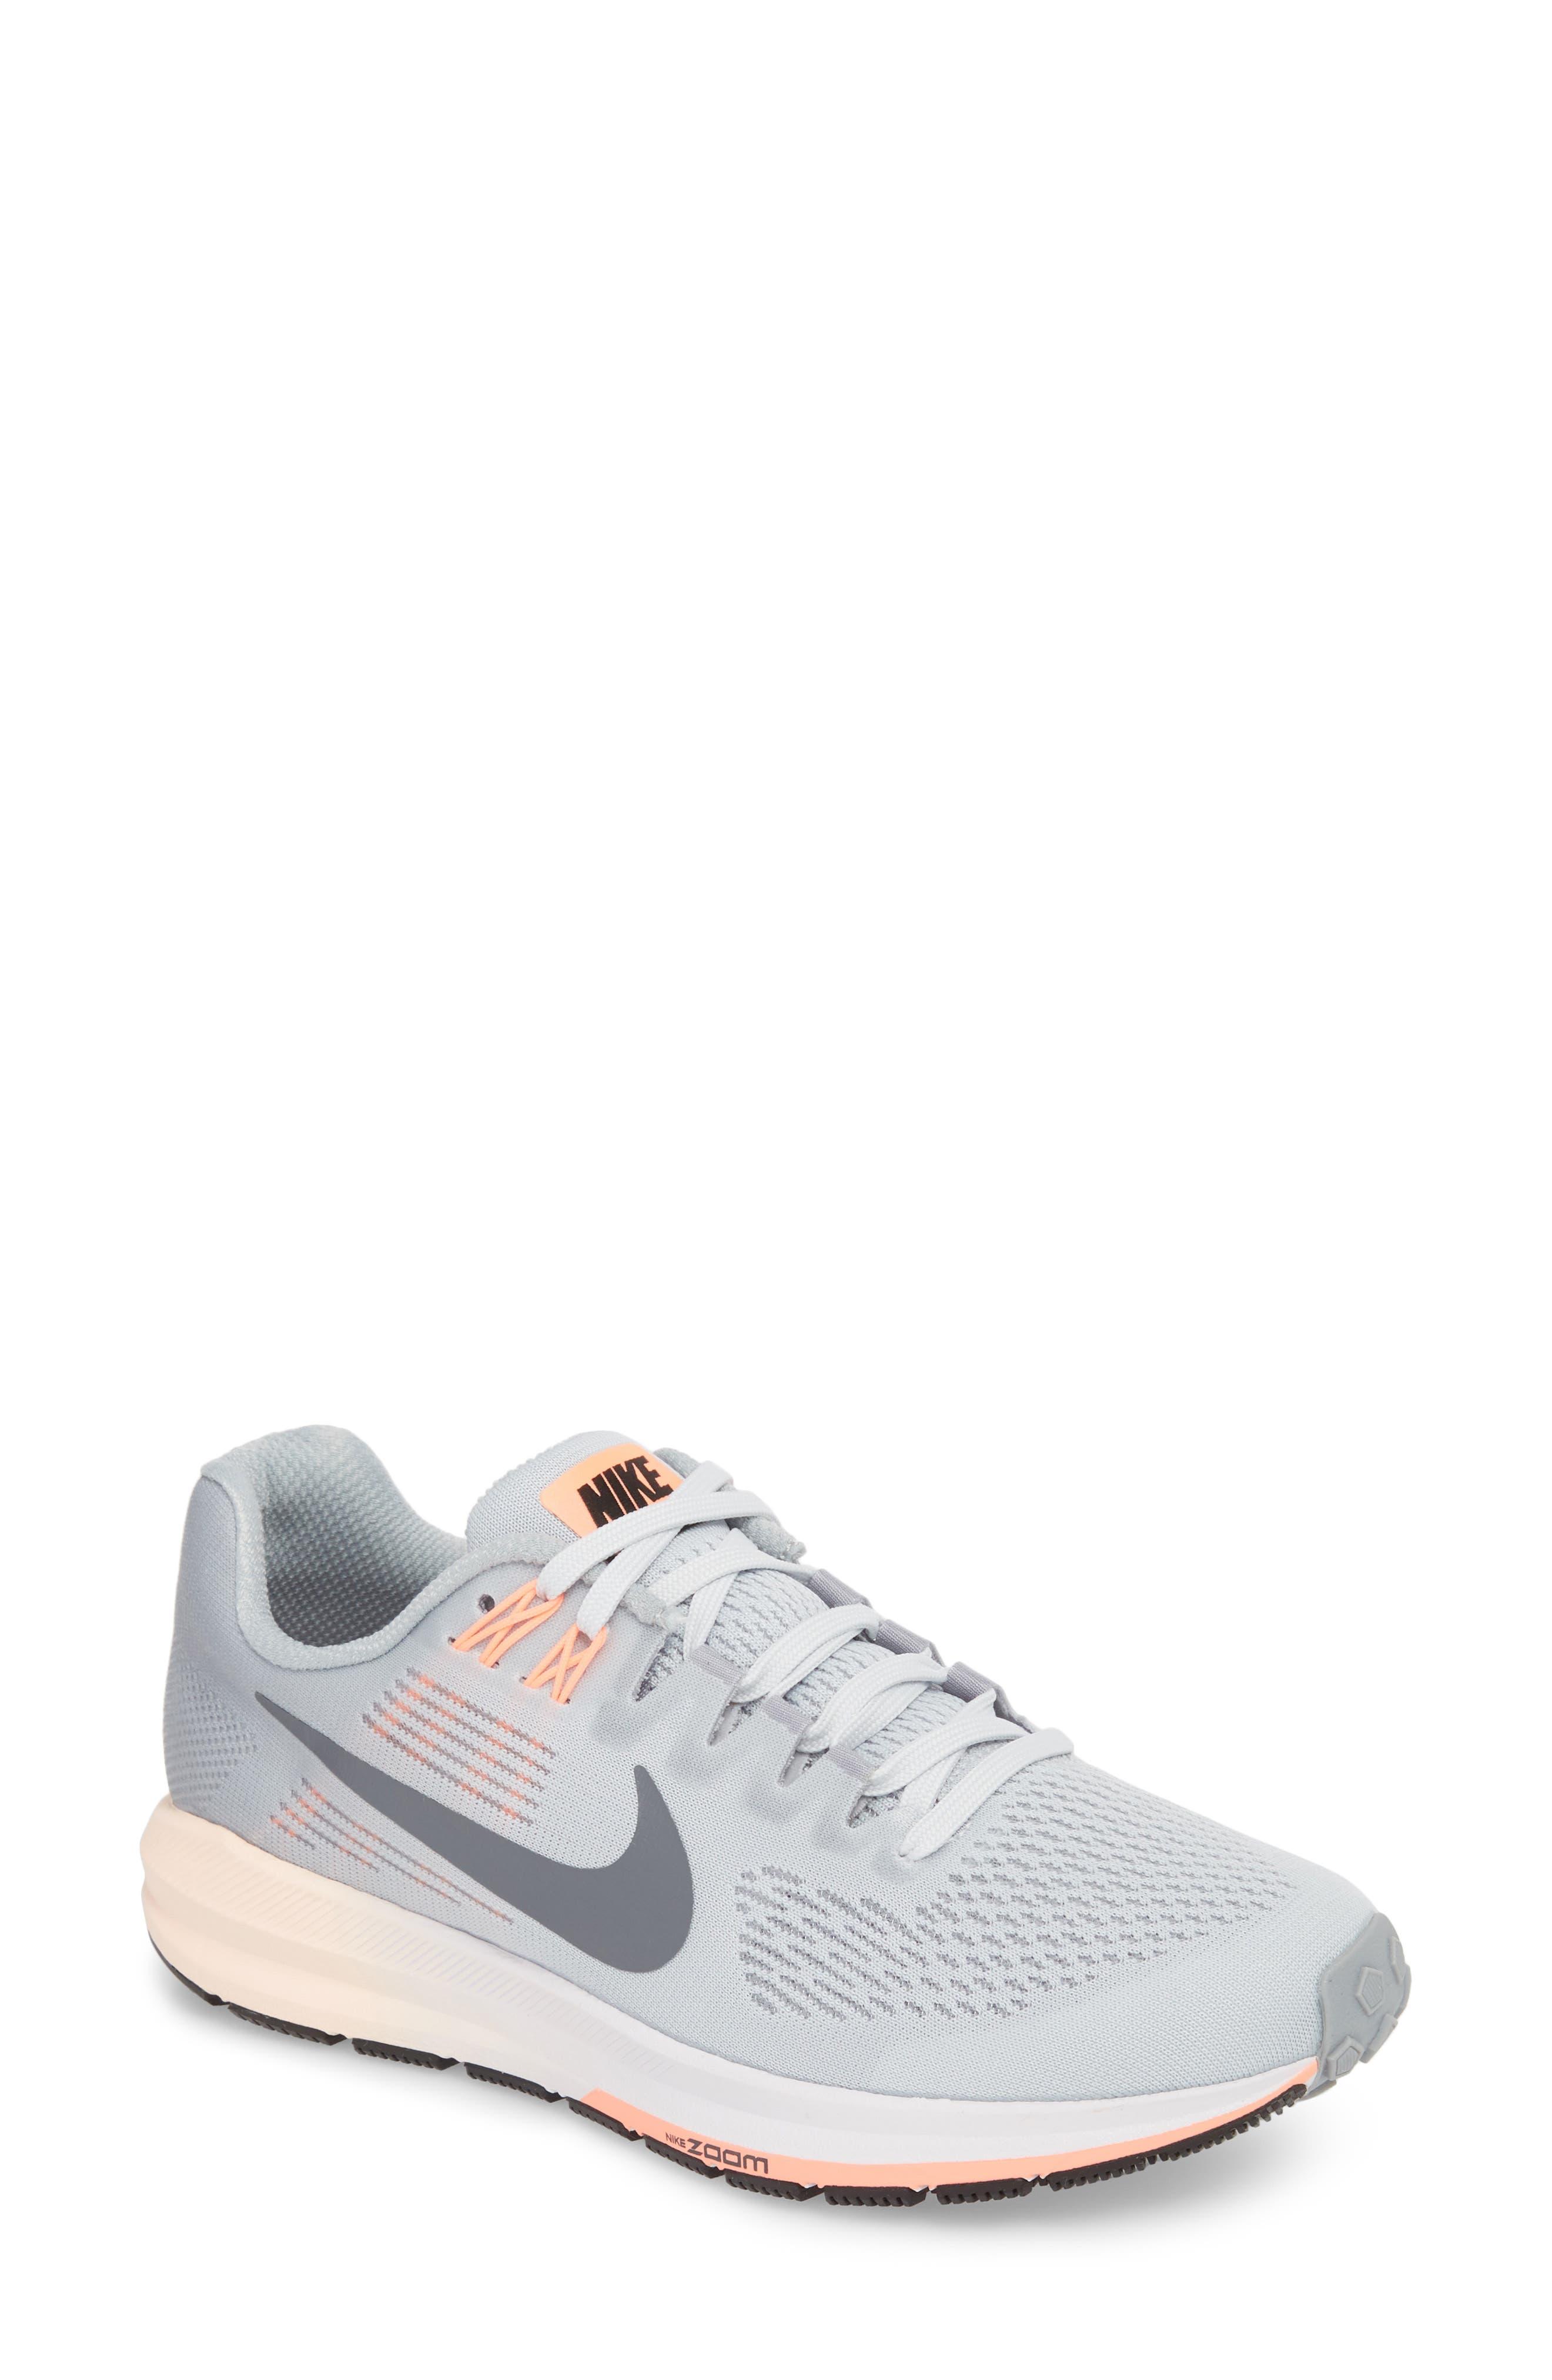 Nike Air Zoom Structure 21 Running Shoe (Women)